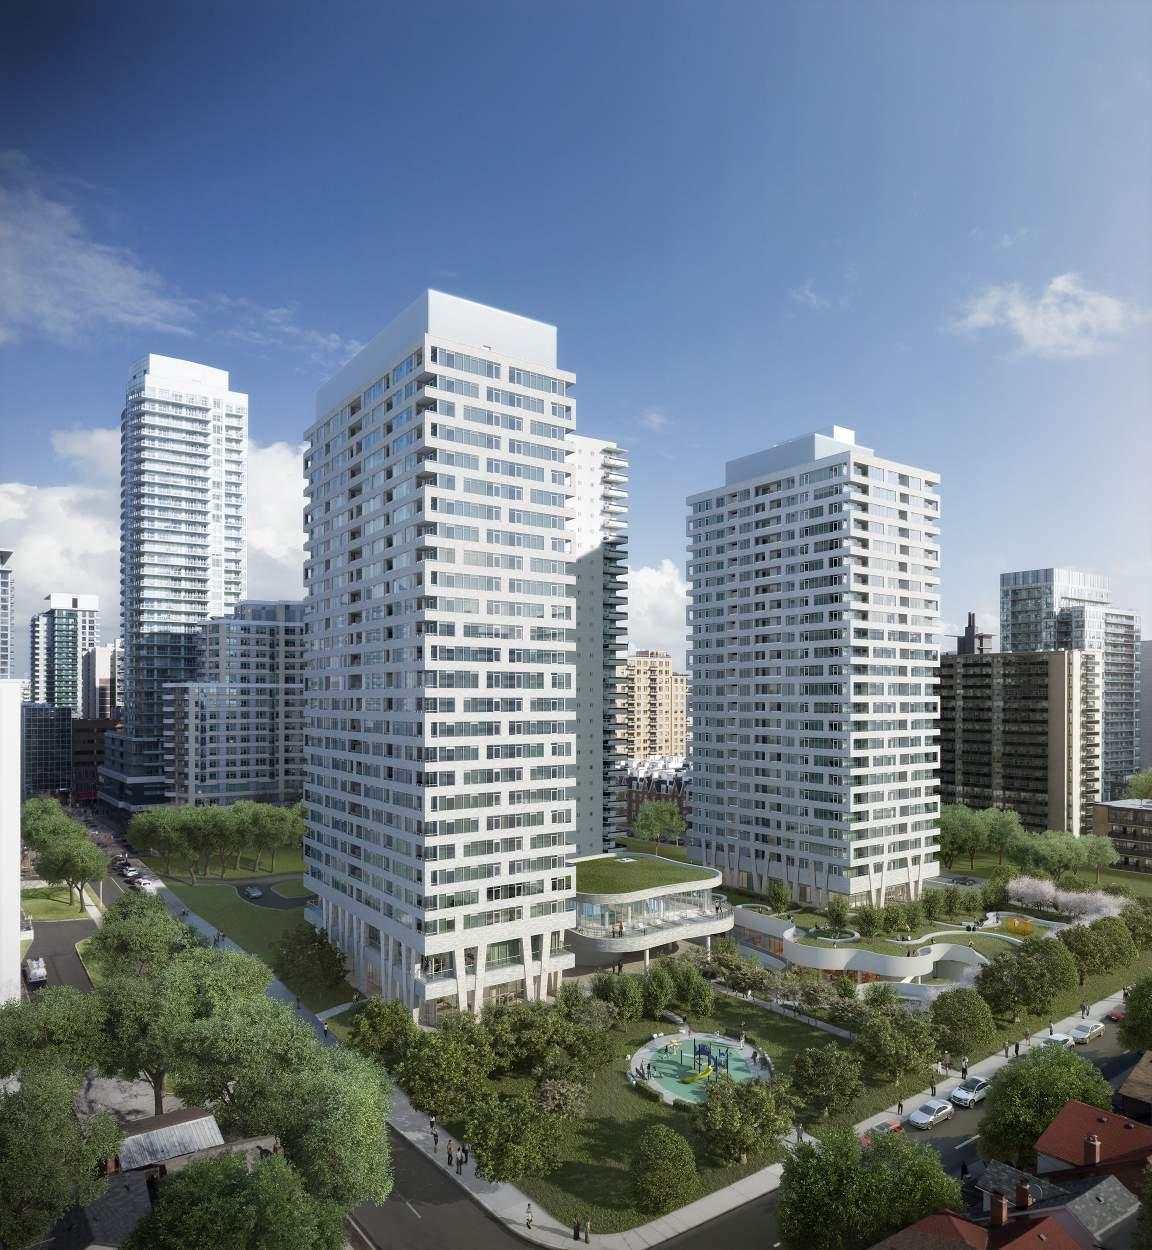 Toronto Canada Apartments For Rent: Rentals.ca :) 44 Lillian Street, Toronto ON For Rent